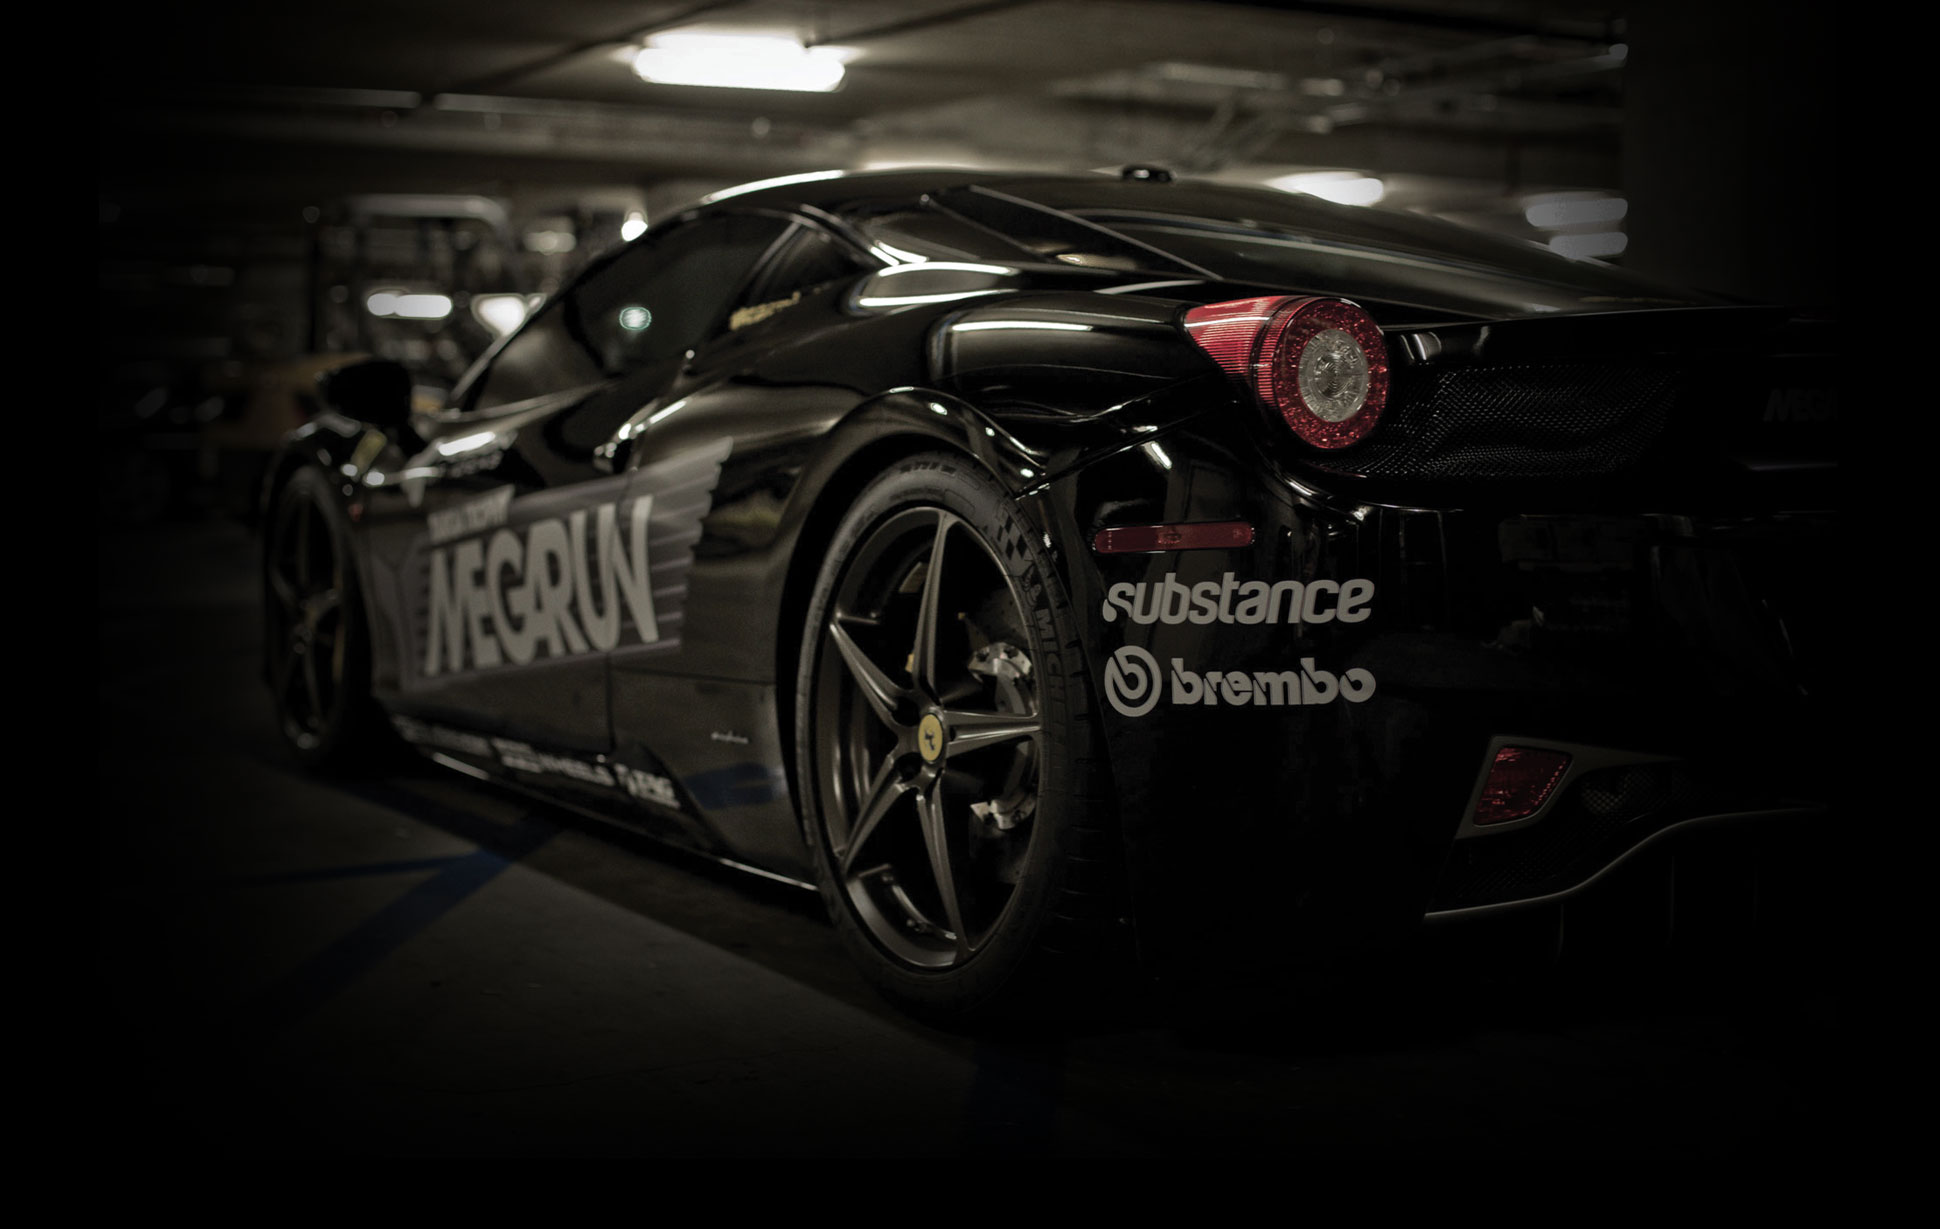 substance_car